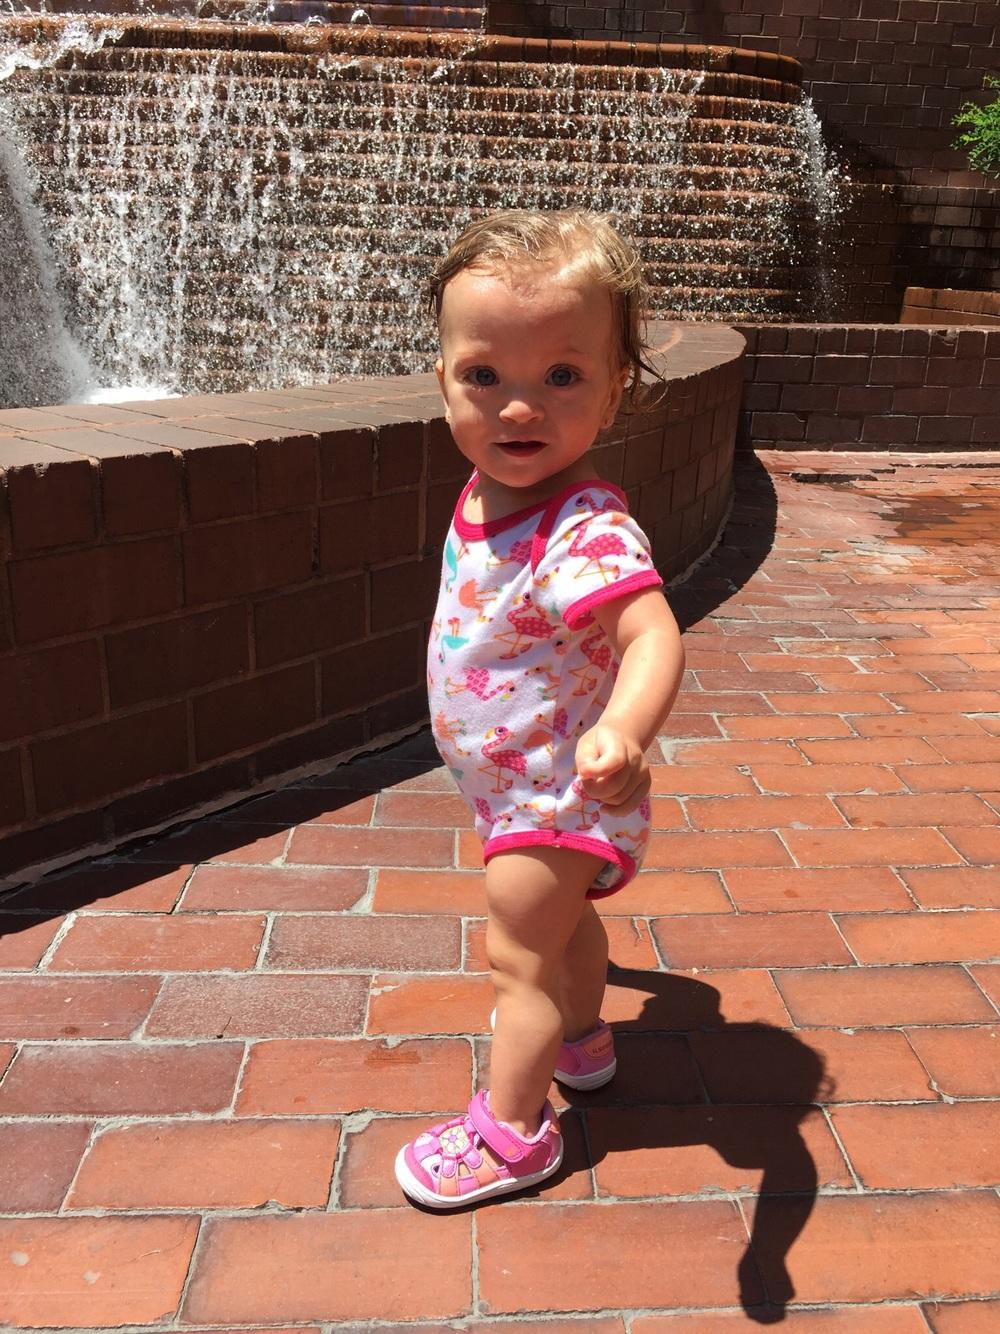 Splashing around!